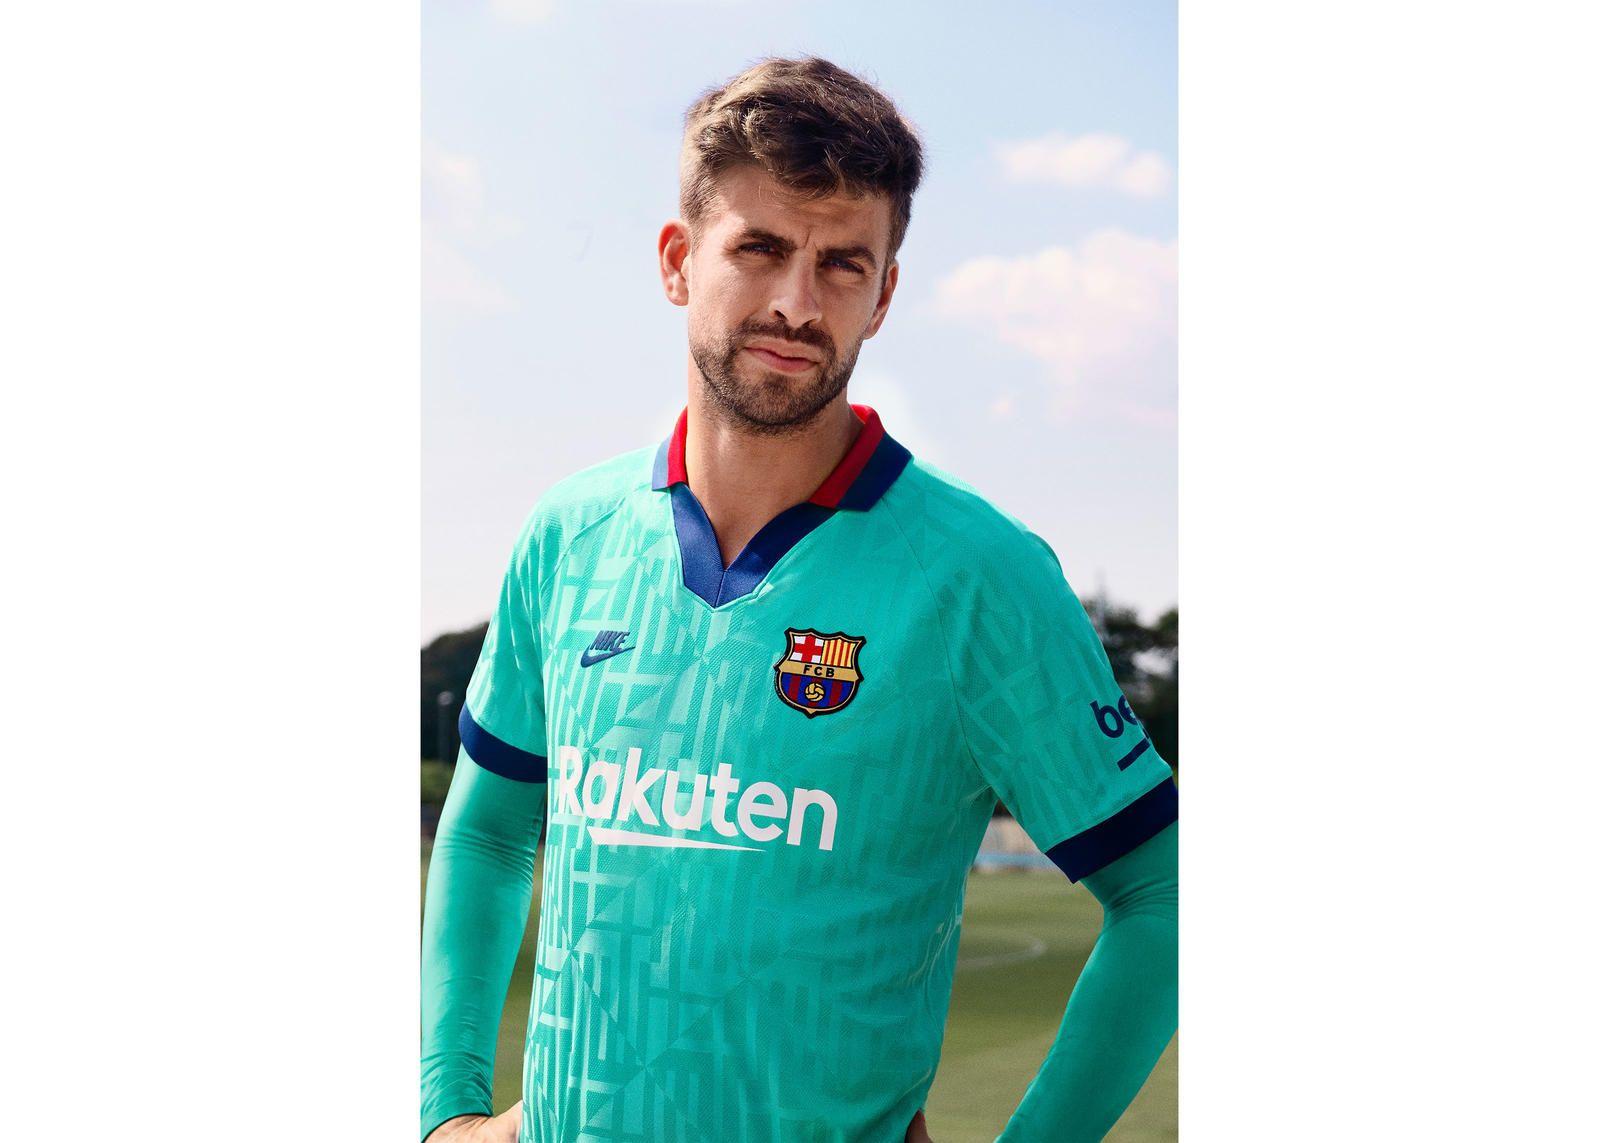 pin on barcelona soccer jersey pin on barcelona soccer jersey